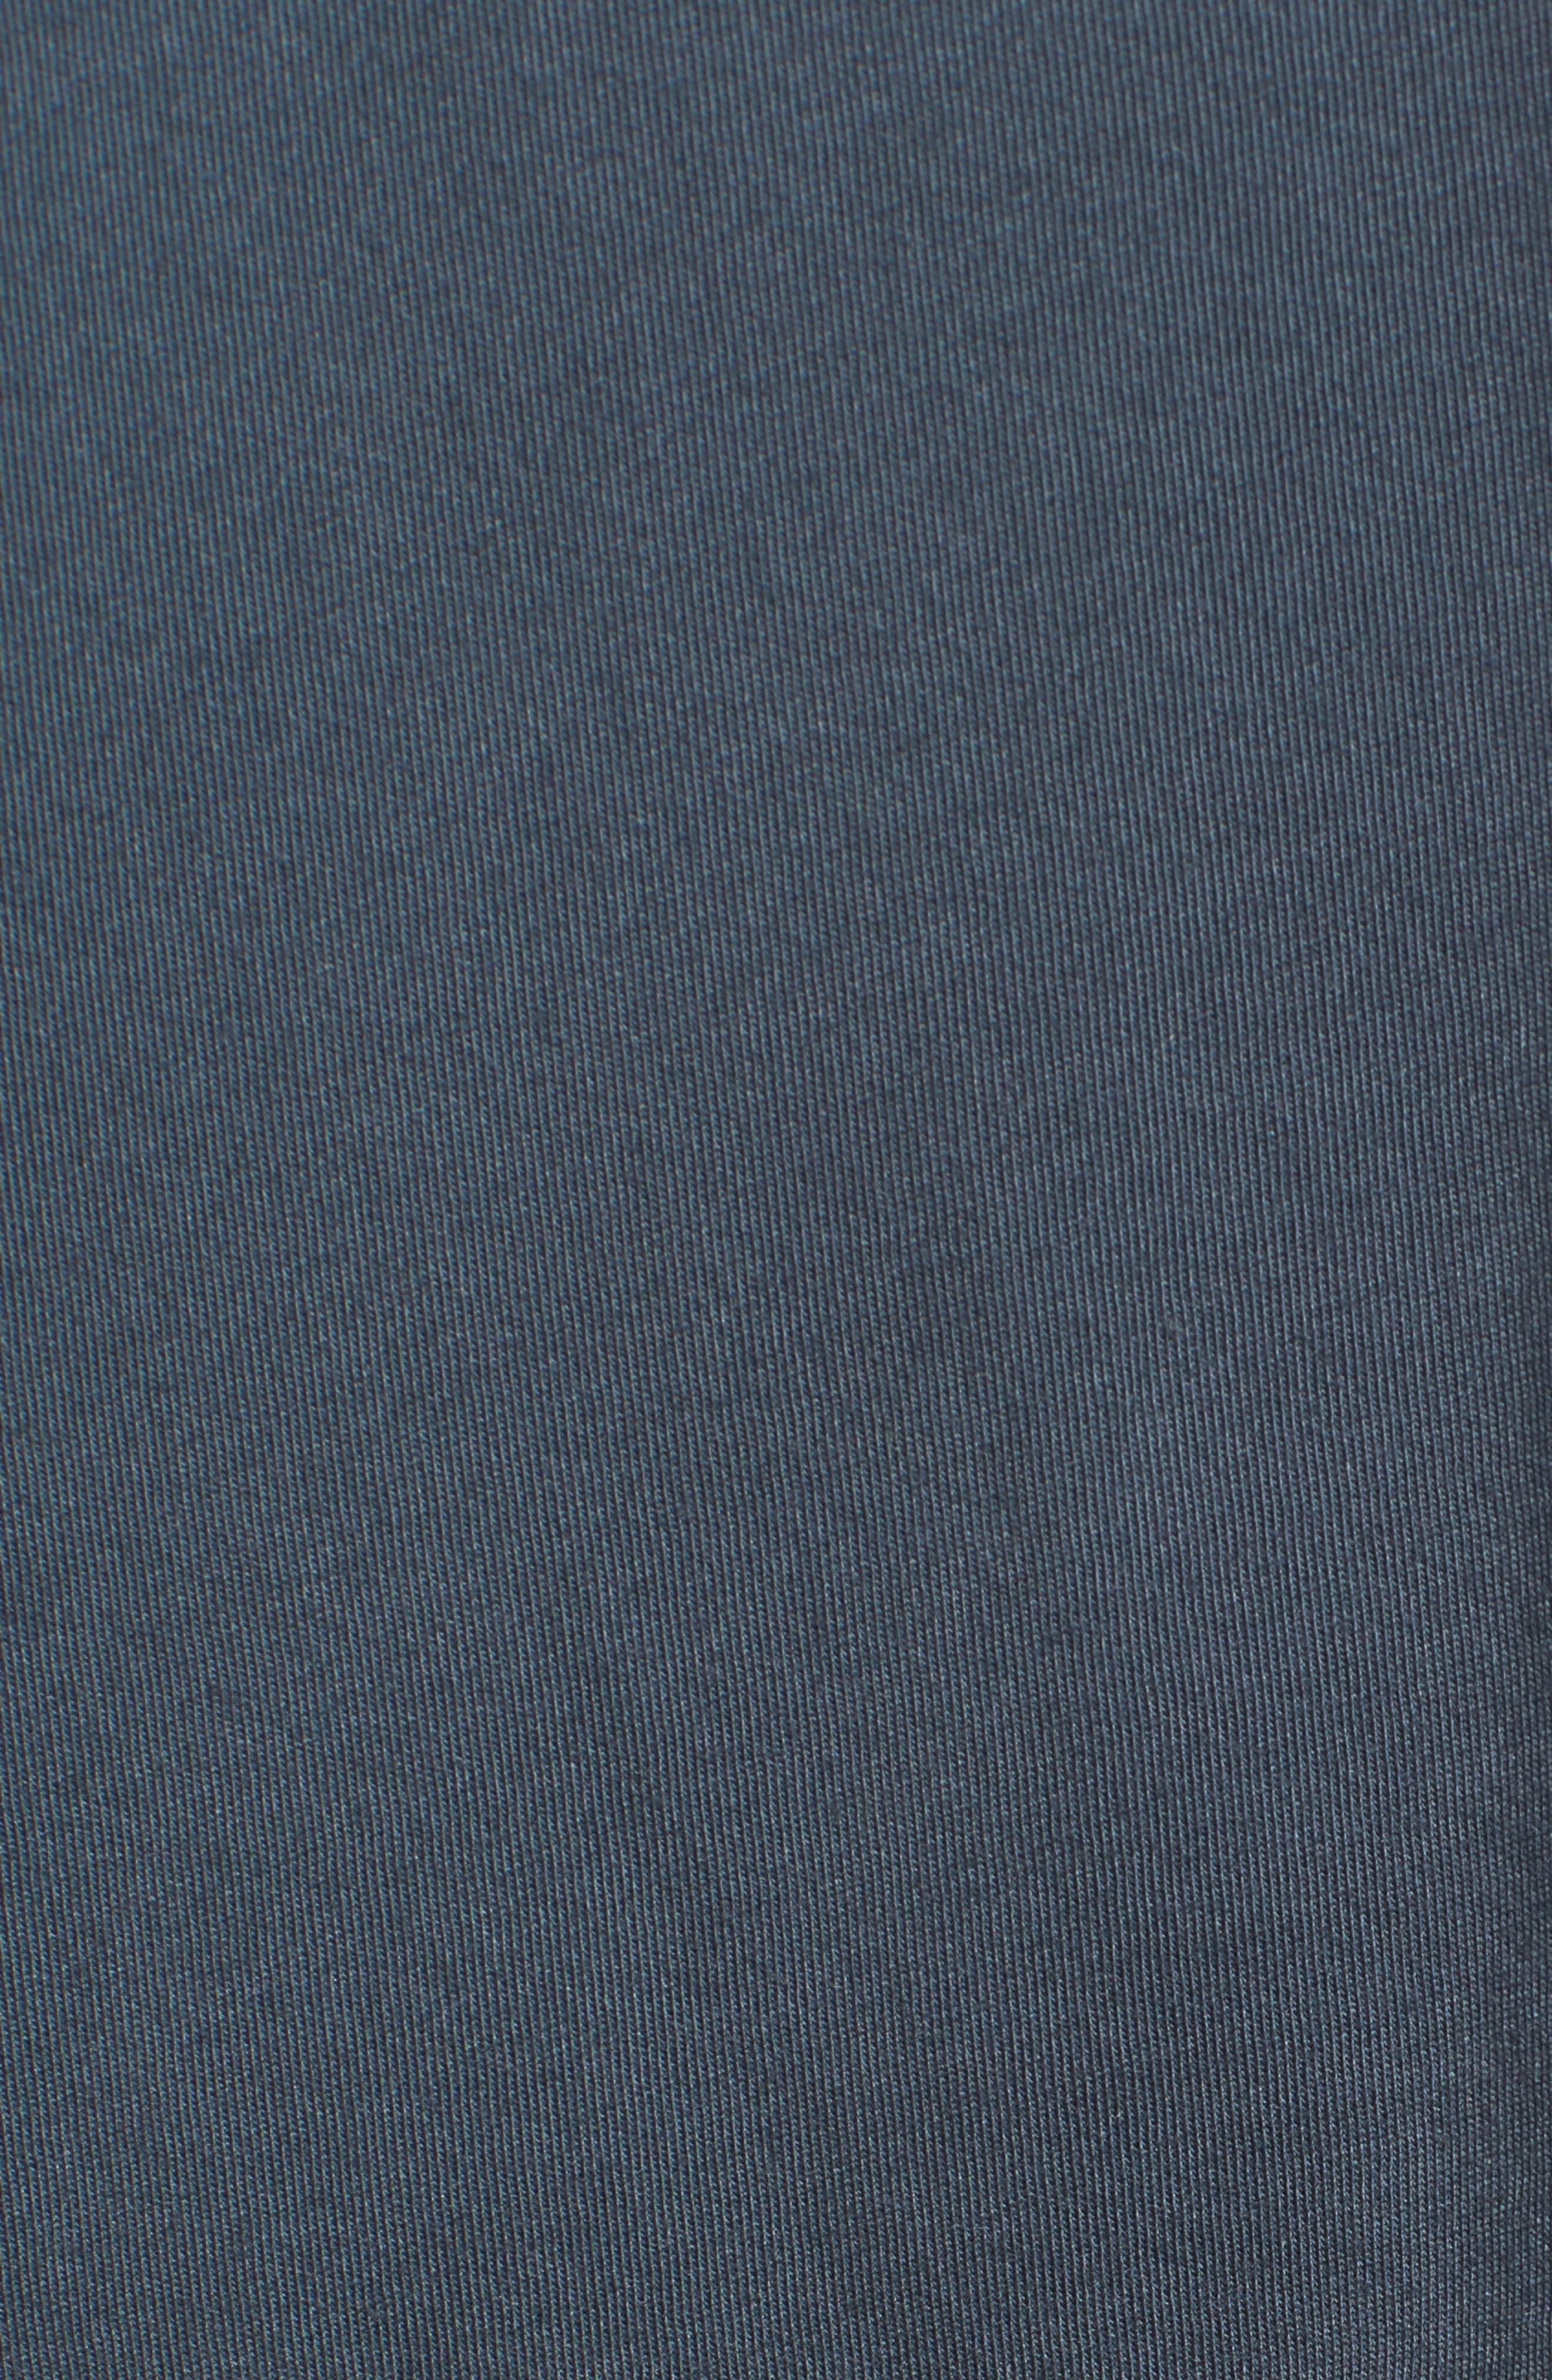 Bryce Slim Fit T-Shirt,                             Alternate thumbnail 20, color,